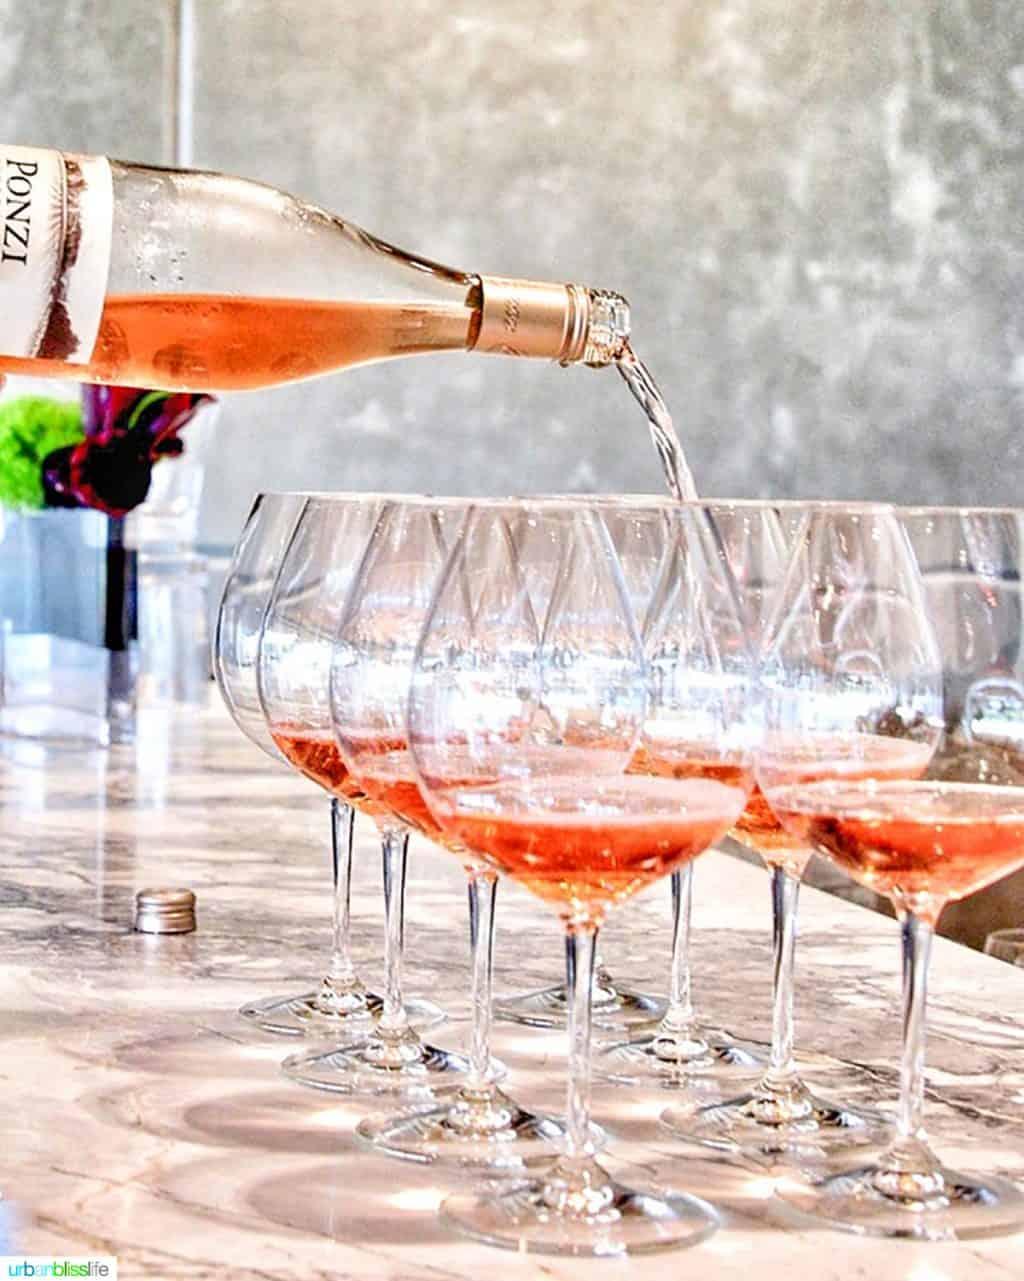 Ponzi rose wine pouring into wine glasses